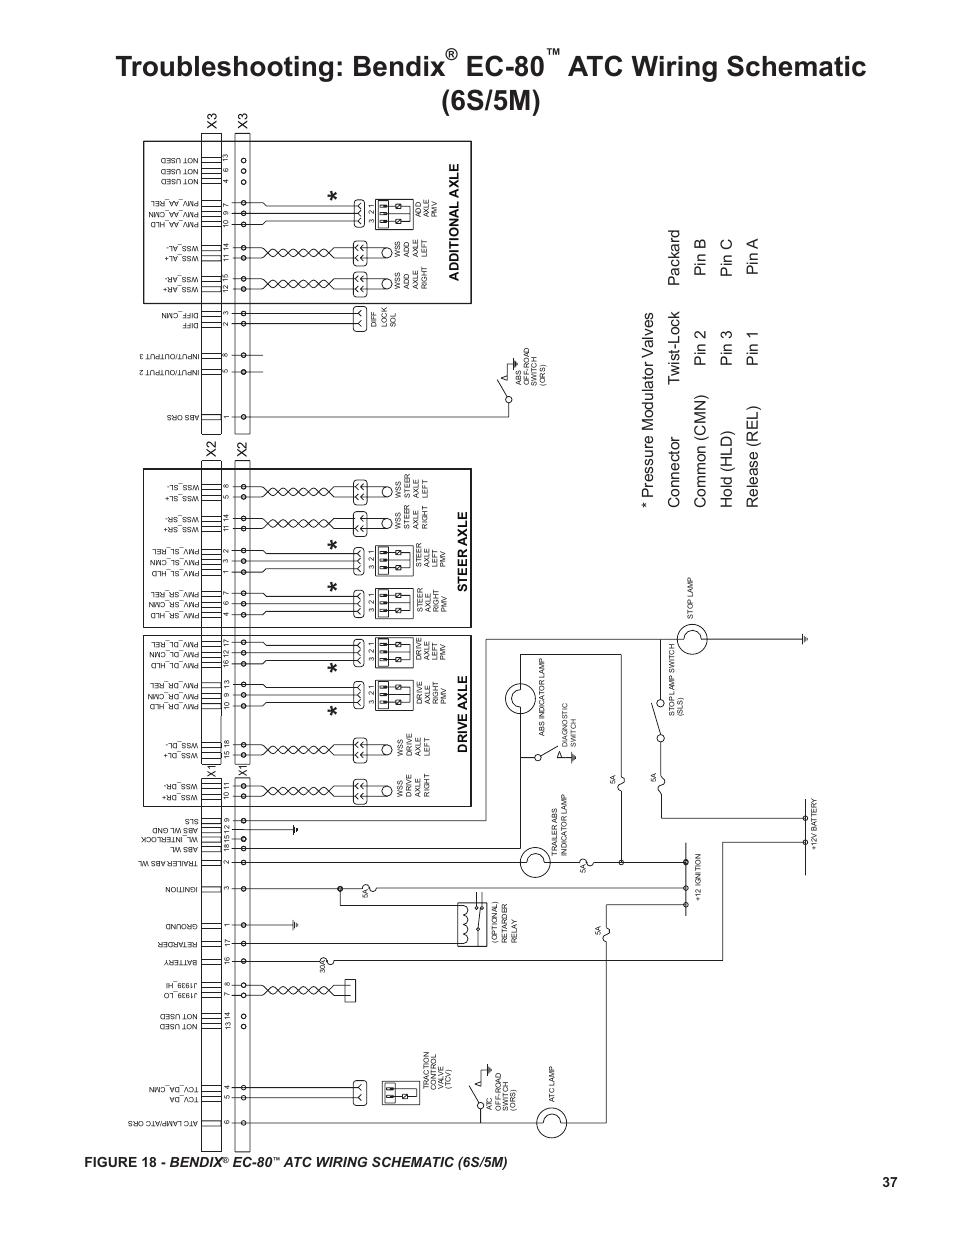 Wl Wiring Diagram Troubleshooting Bendix Ec 80 37 Figure 18 Bendix